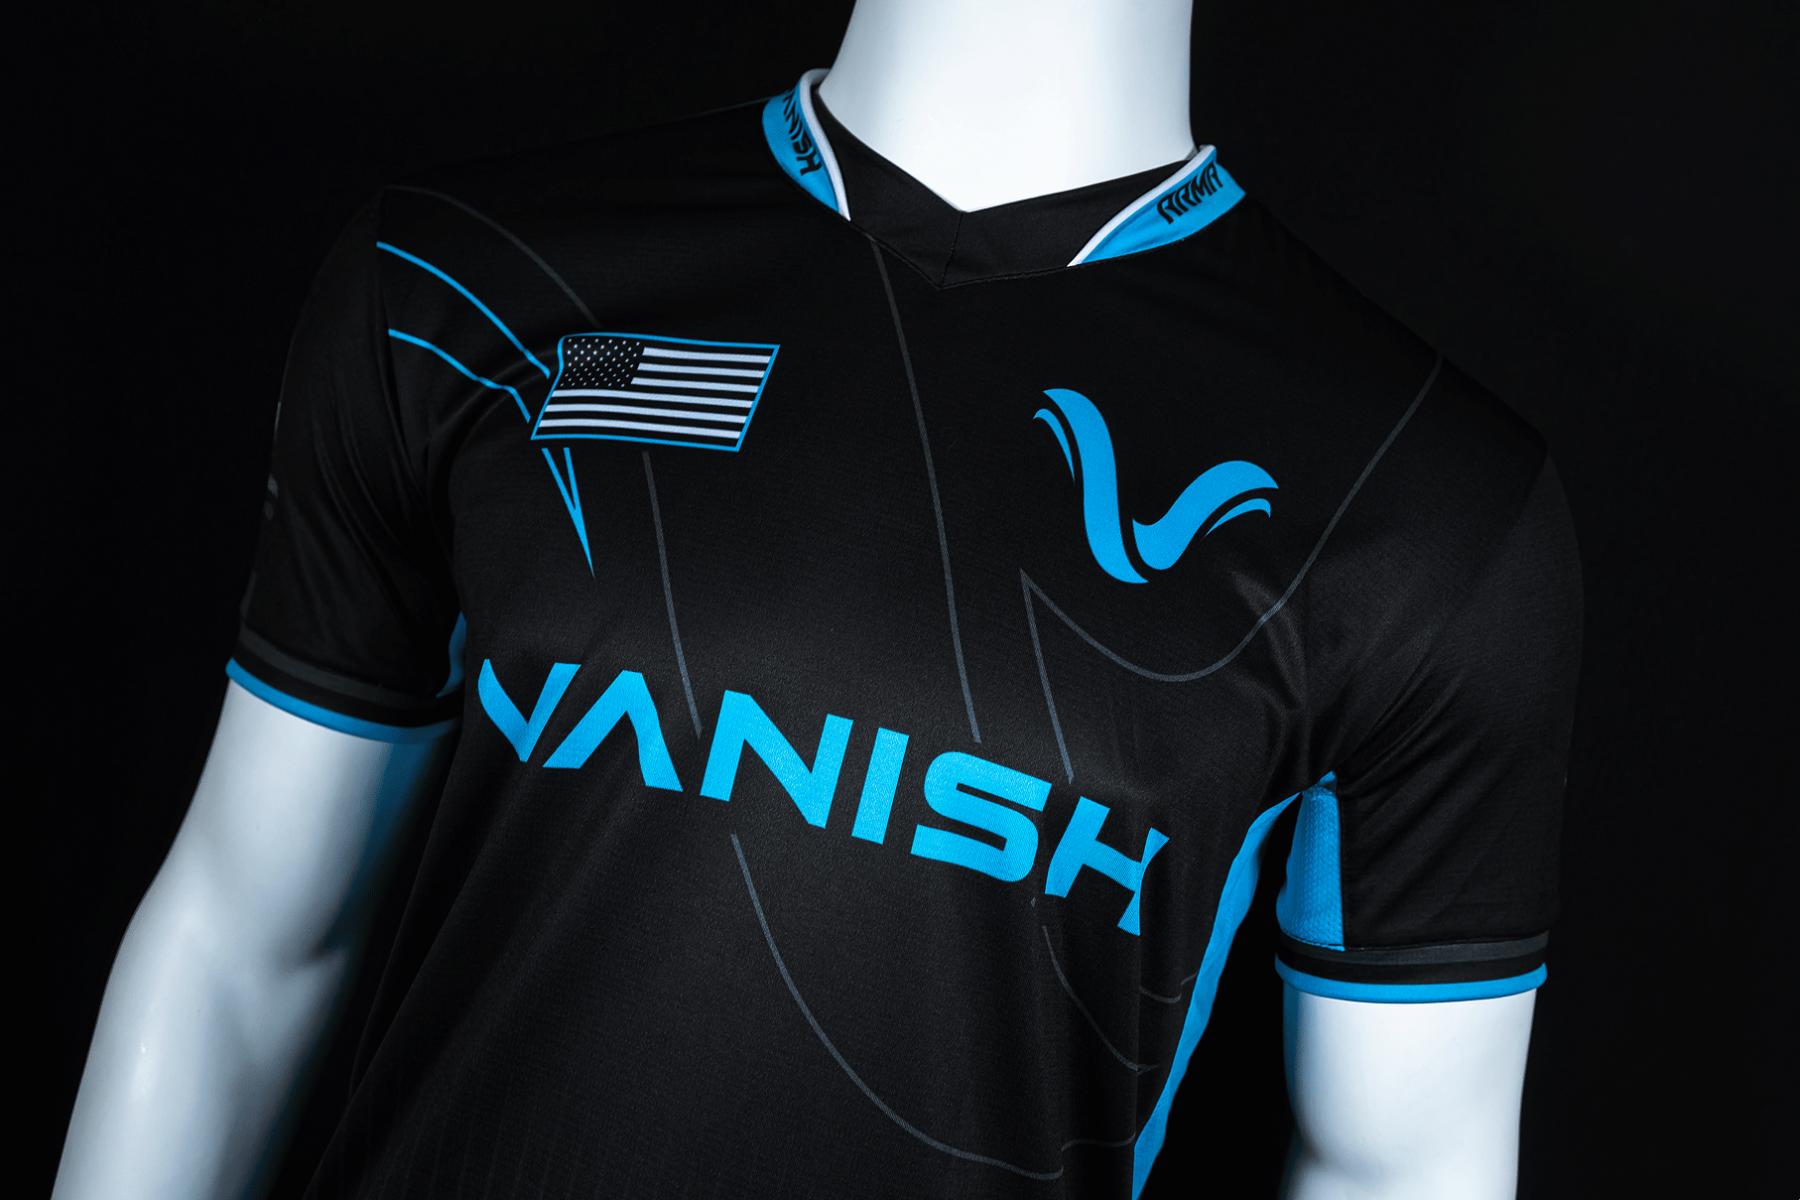 Team Vanish DTS